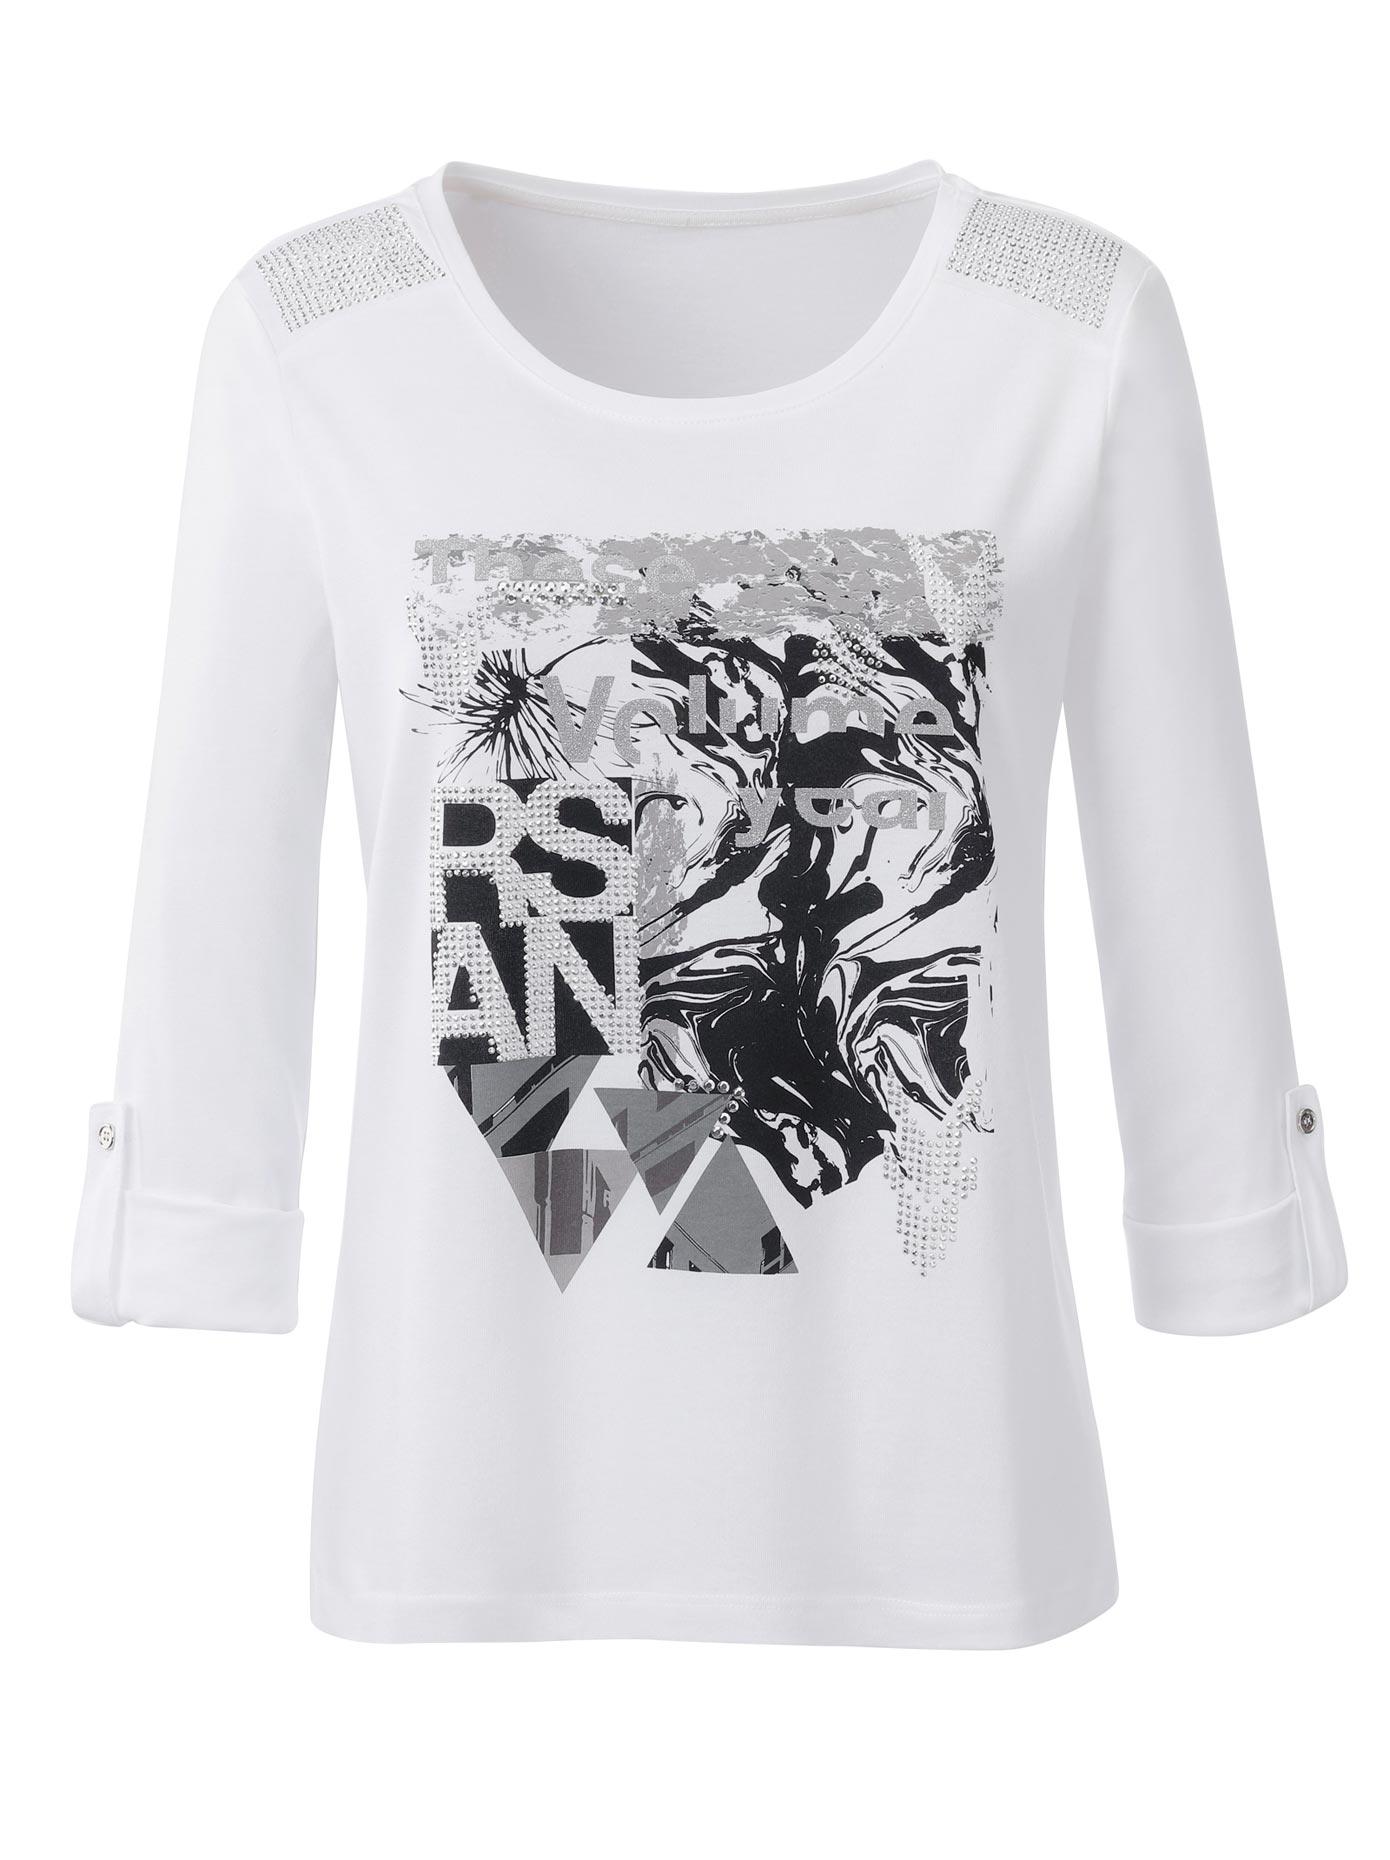 inspirationen - Classic  Shirt mit effektvollem Druck